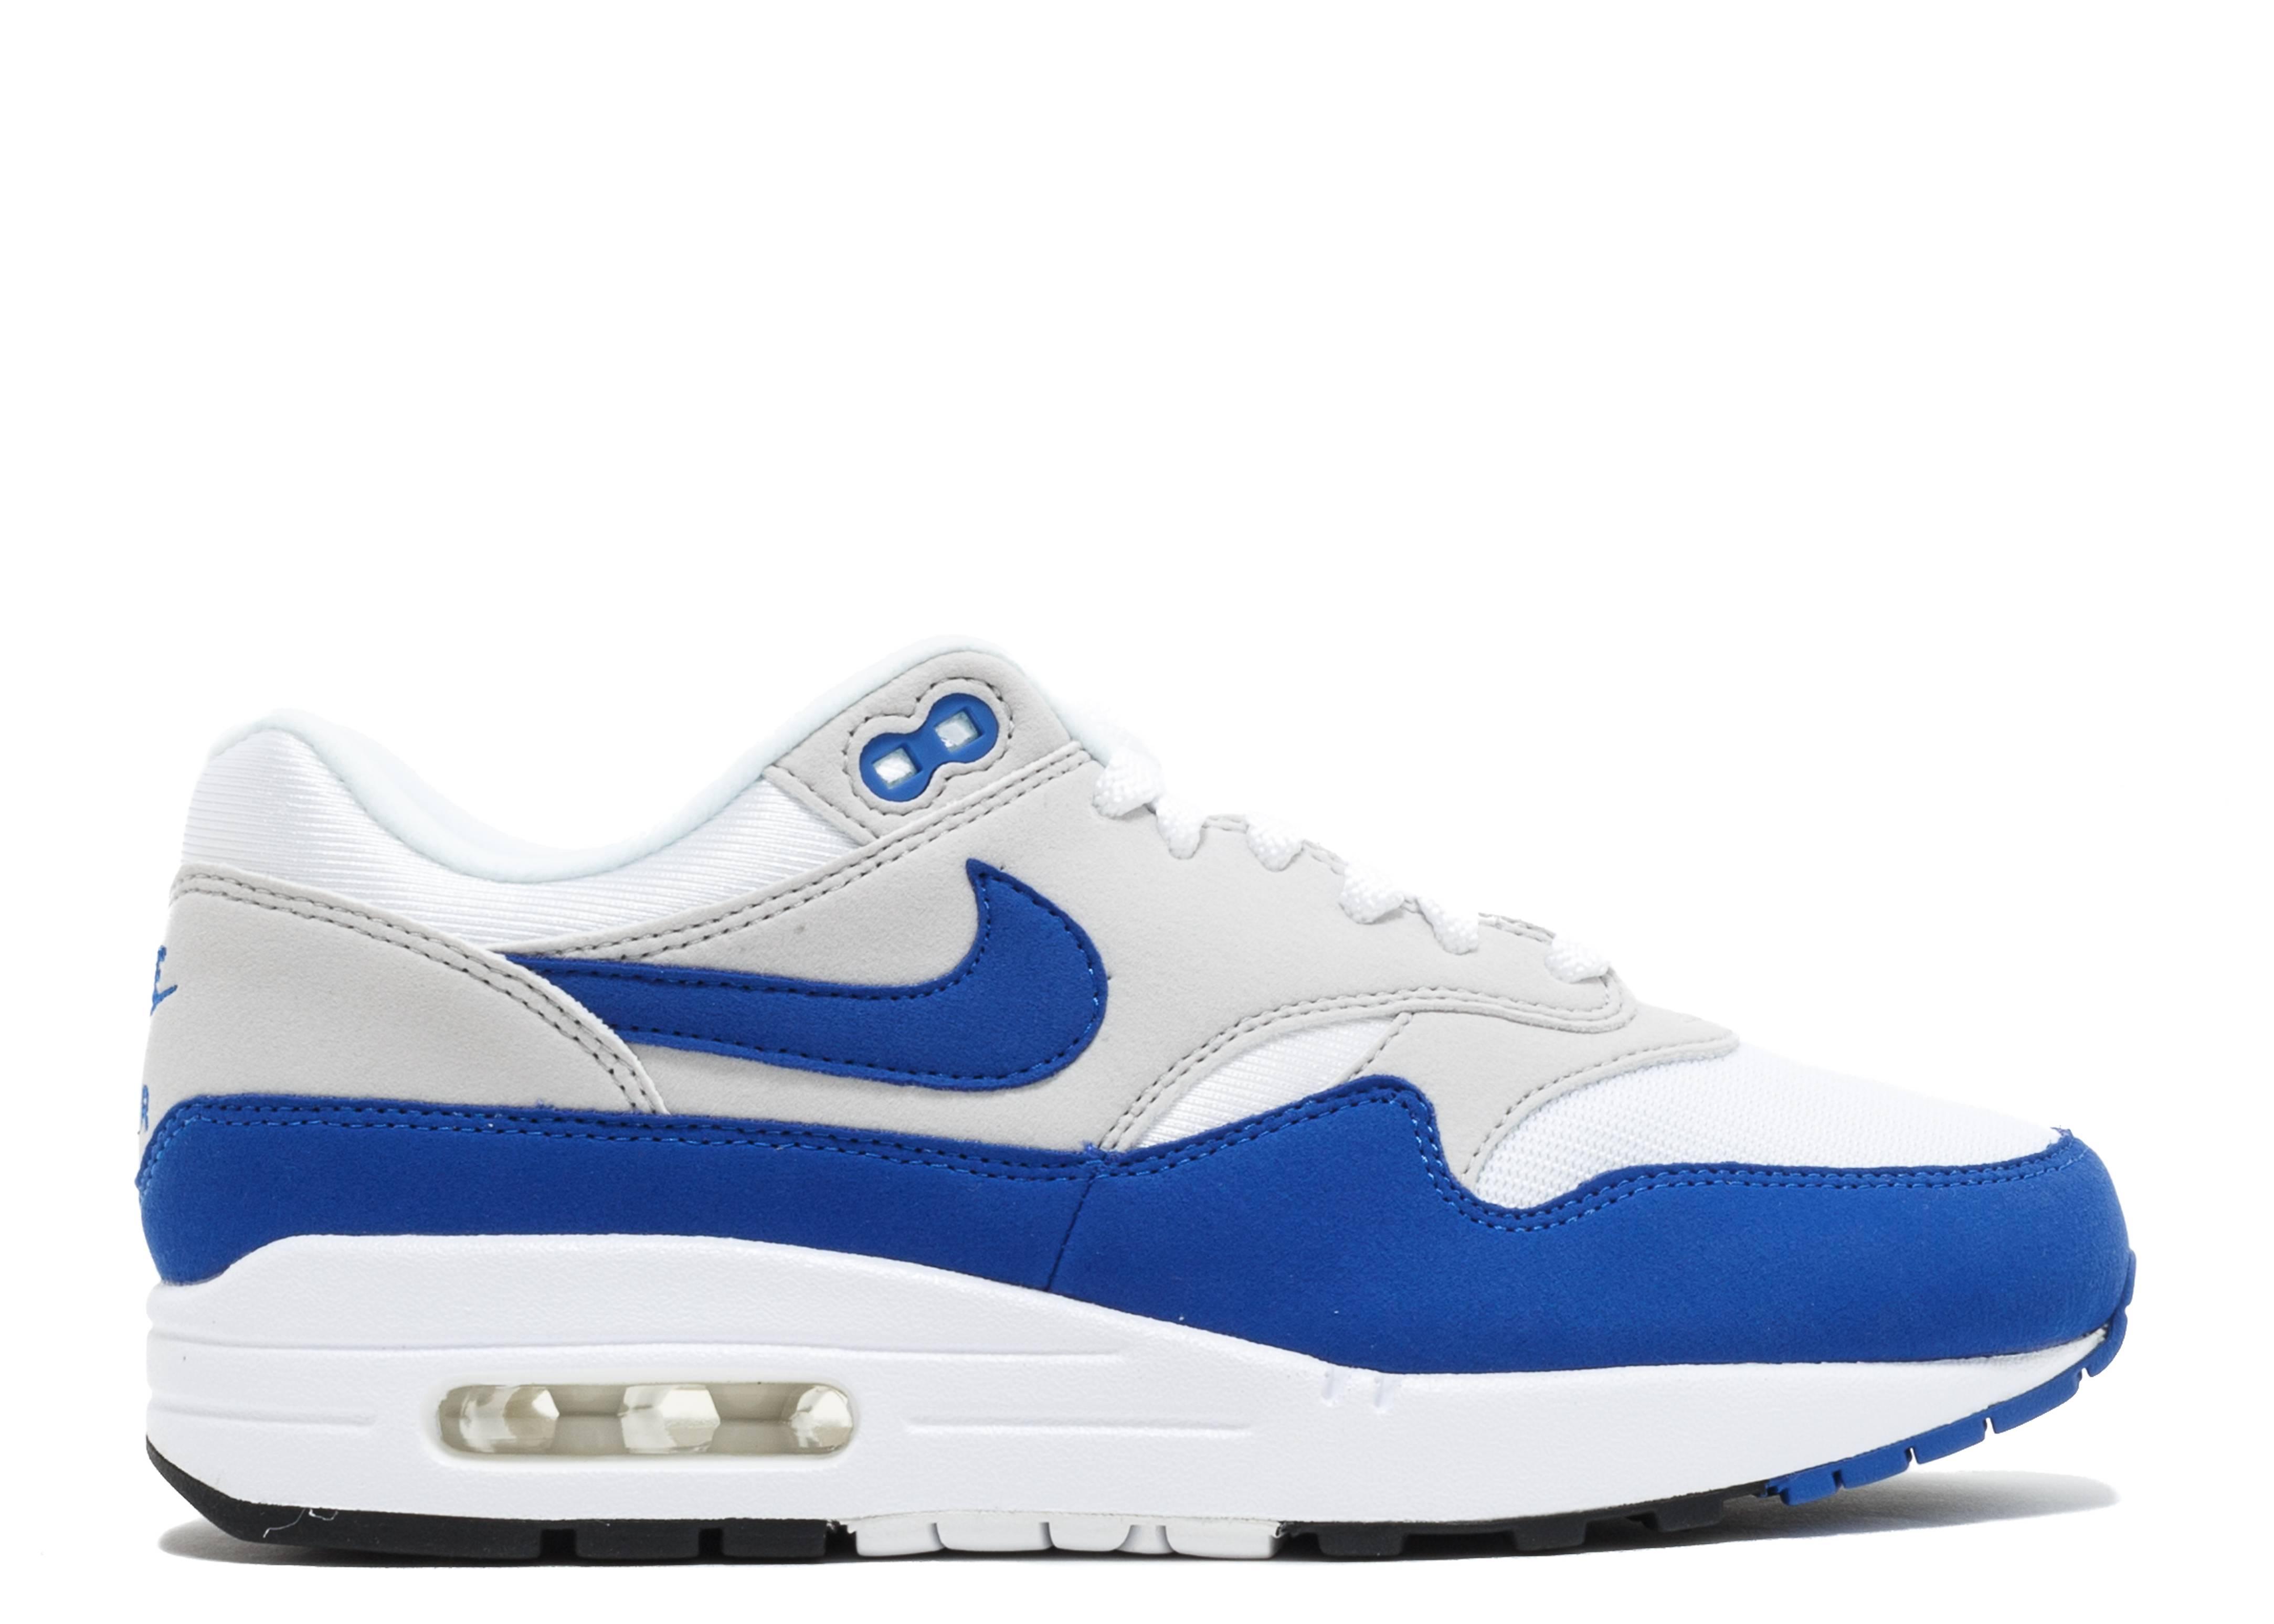 "Men's And Women's Nike Air Max 1 OG Anniversary ""Royal"" WhiteGame Royal Neutral Grey 908375 101 Online"